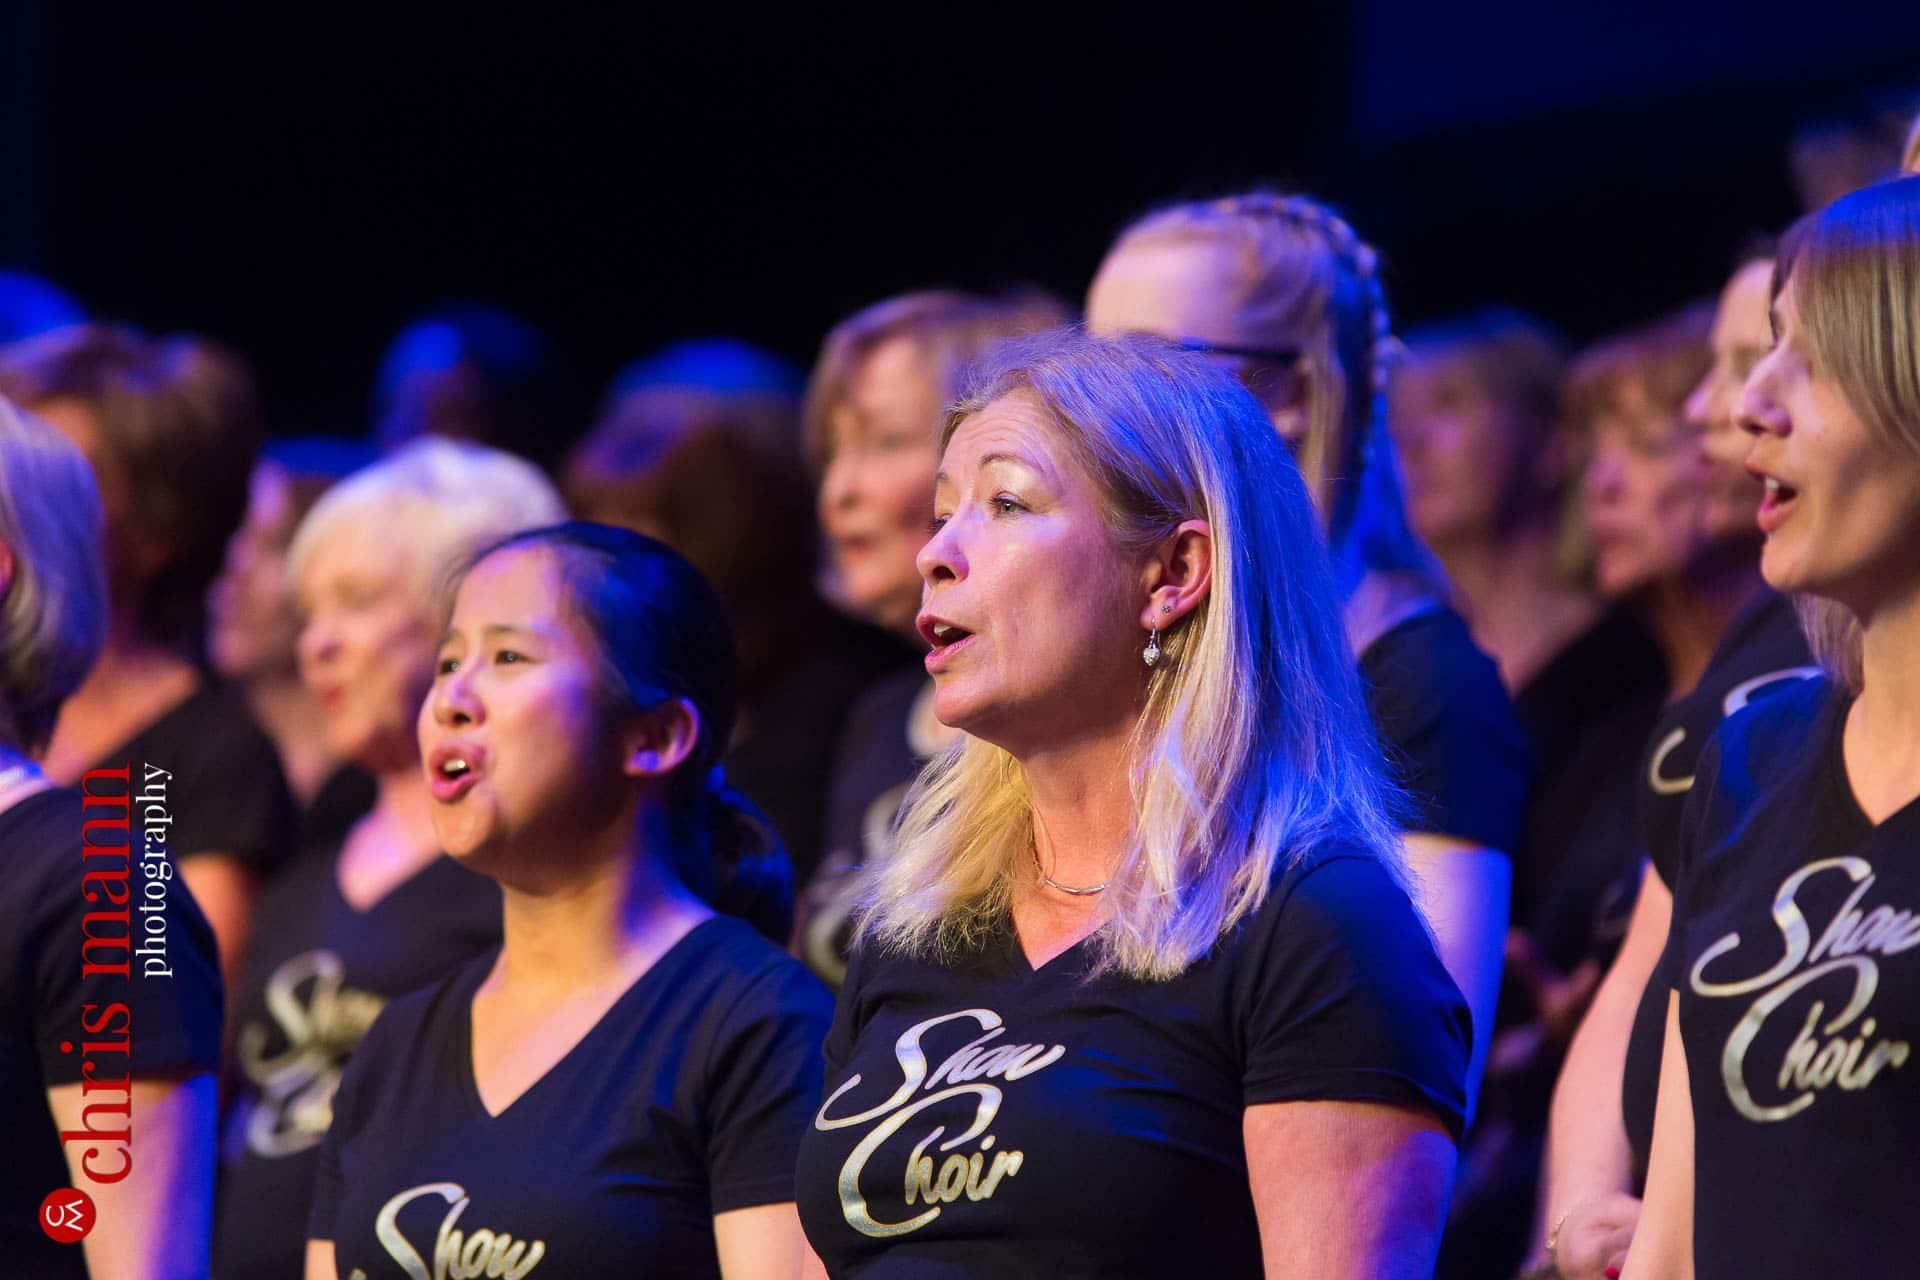 Choiroke-2016-concert-Dorking-Halls-047